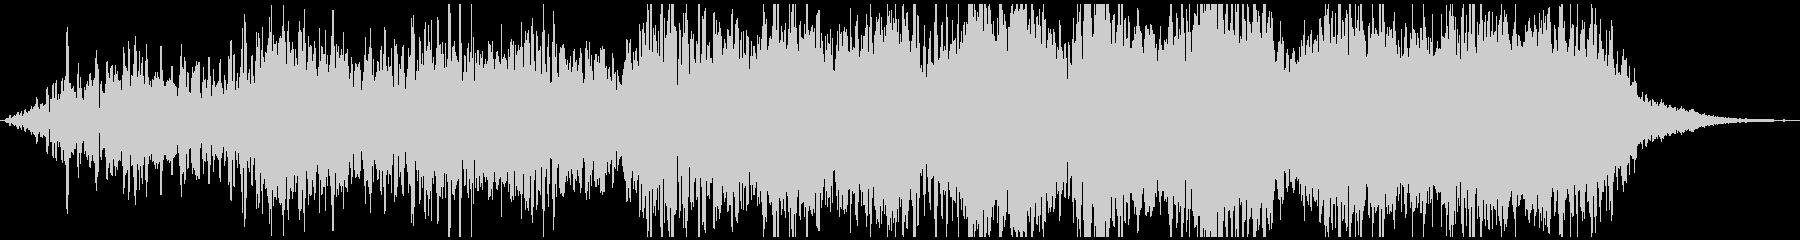 PADS 悲しいUh合唱団01の未再生の波形